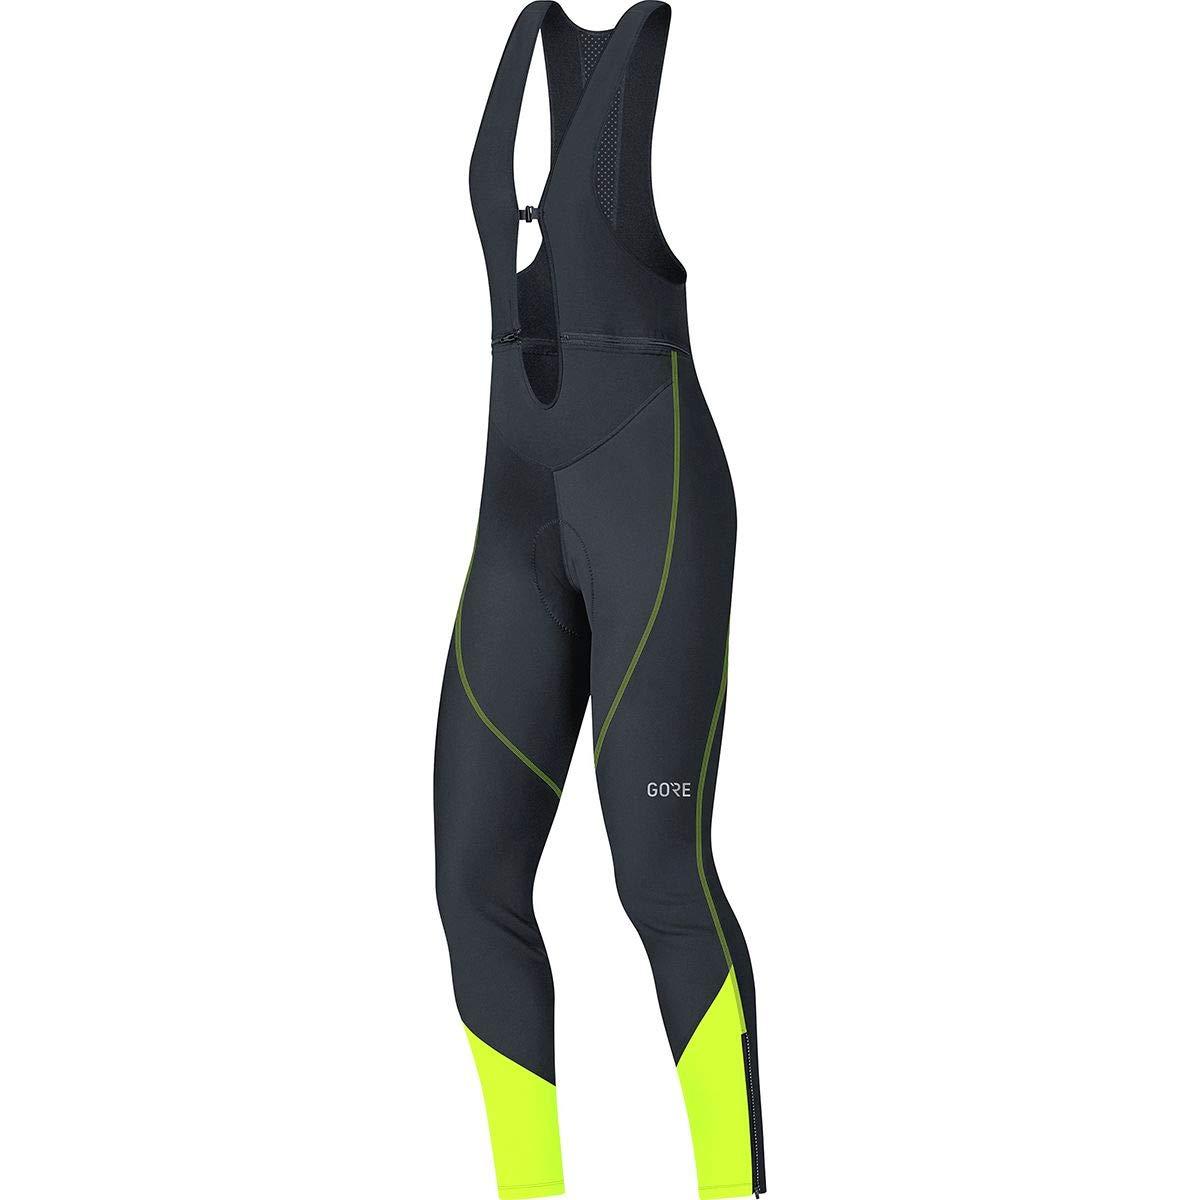 GORE WEAR Women's Long Cycling Bib Tights, C3 Women's Windstopper Bib Tights+, Size: XS, Color: Black/Neon Yellow, 100332